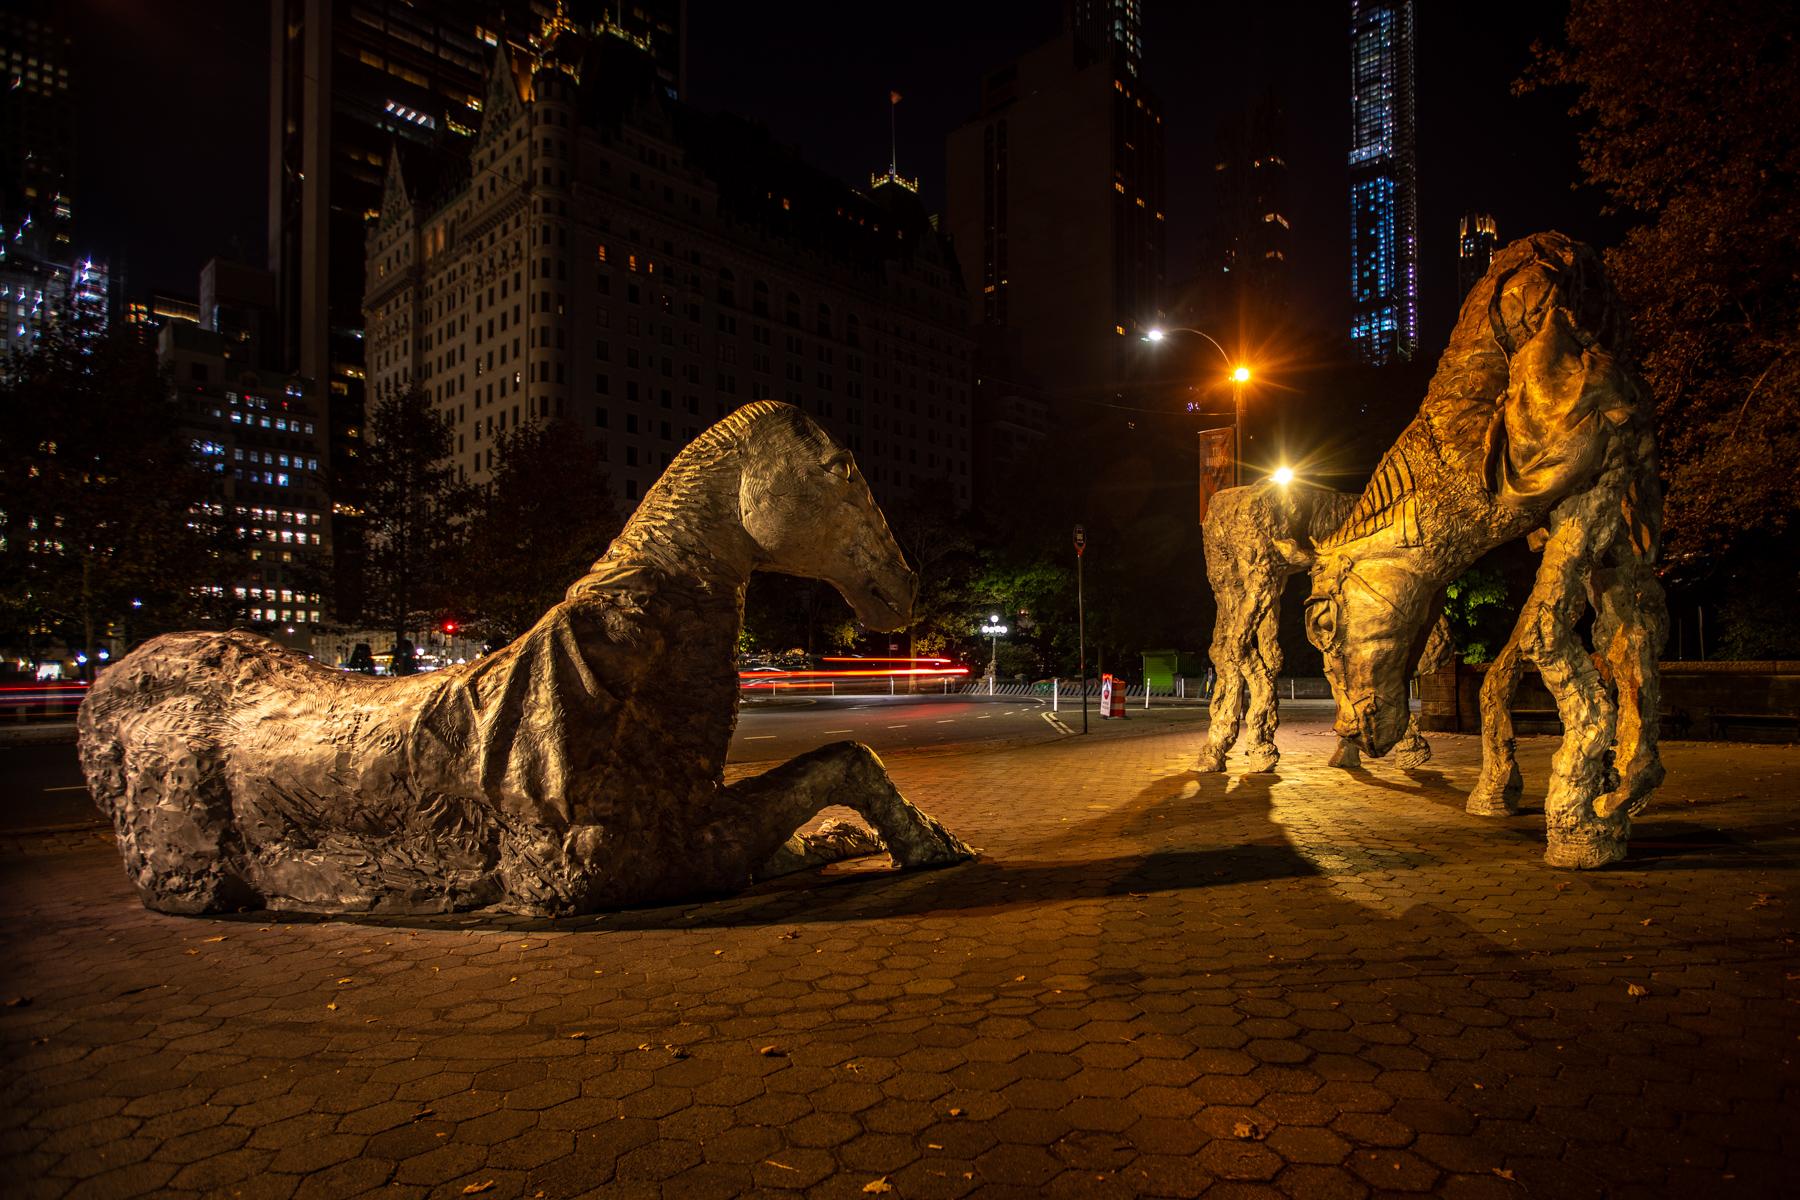 Giant Horse Sculpture, Central Park, New York, USA